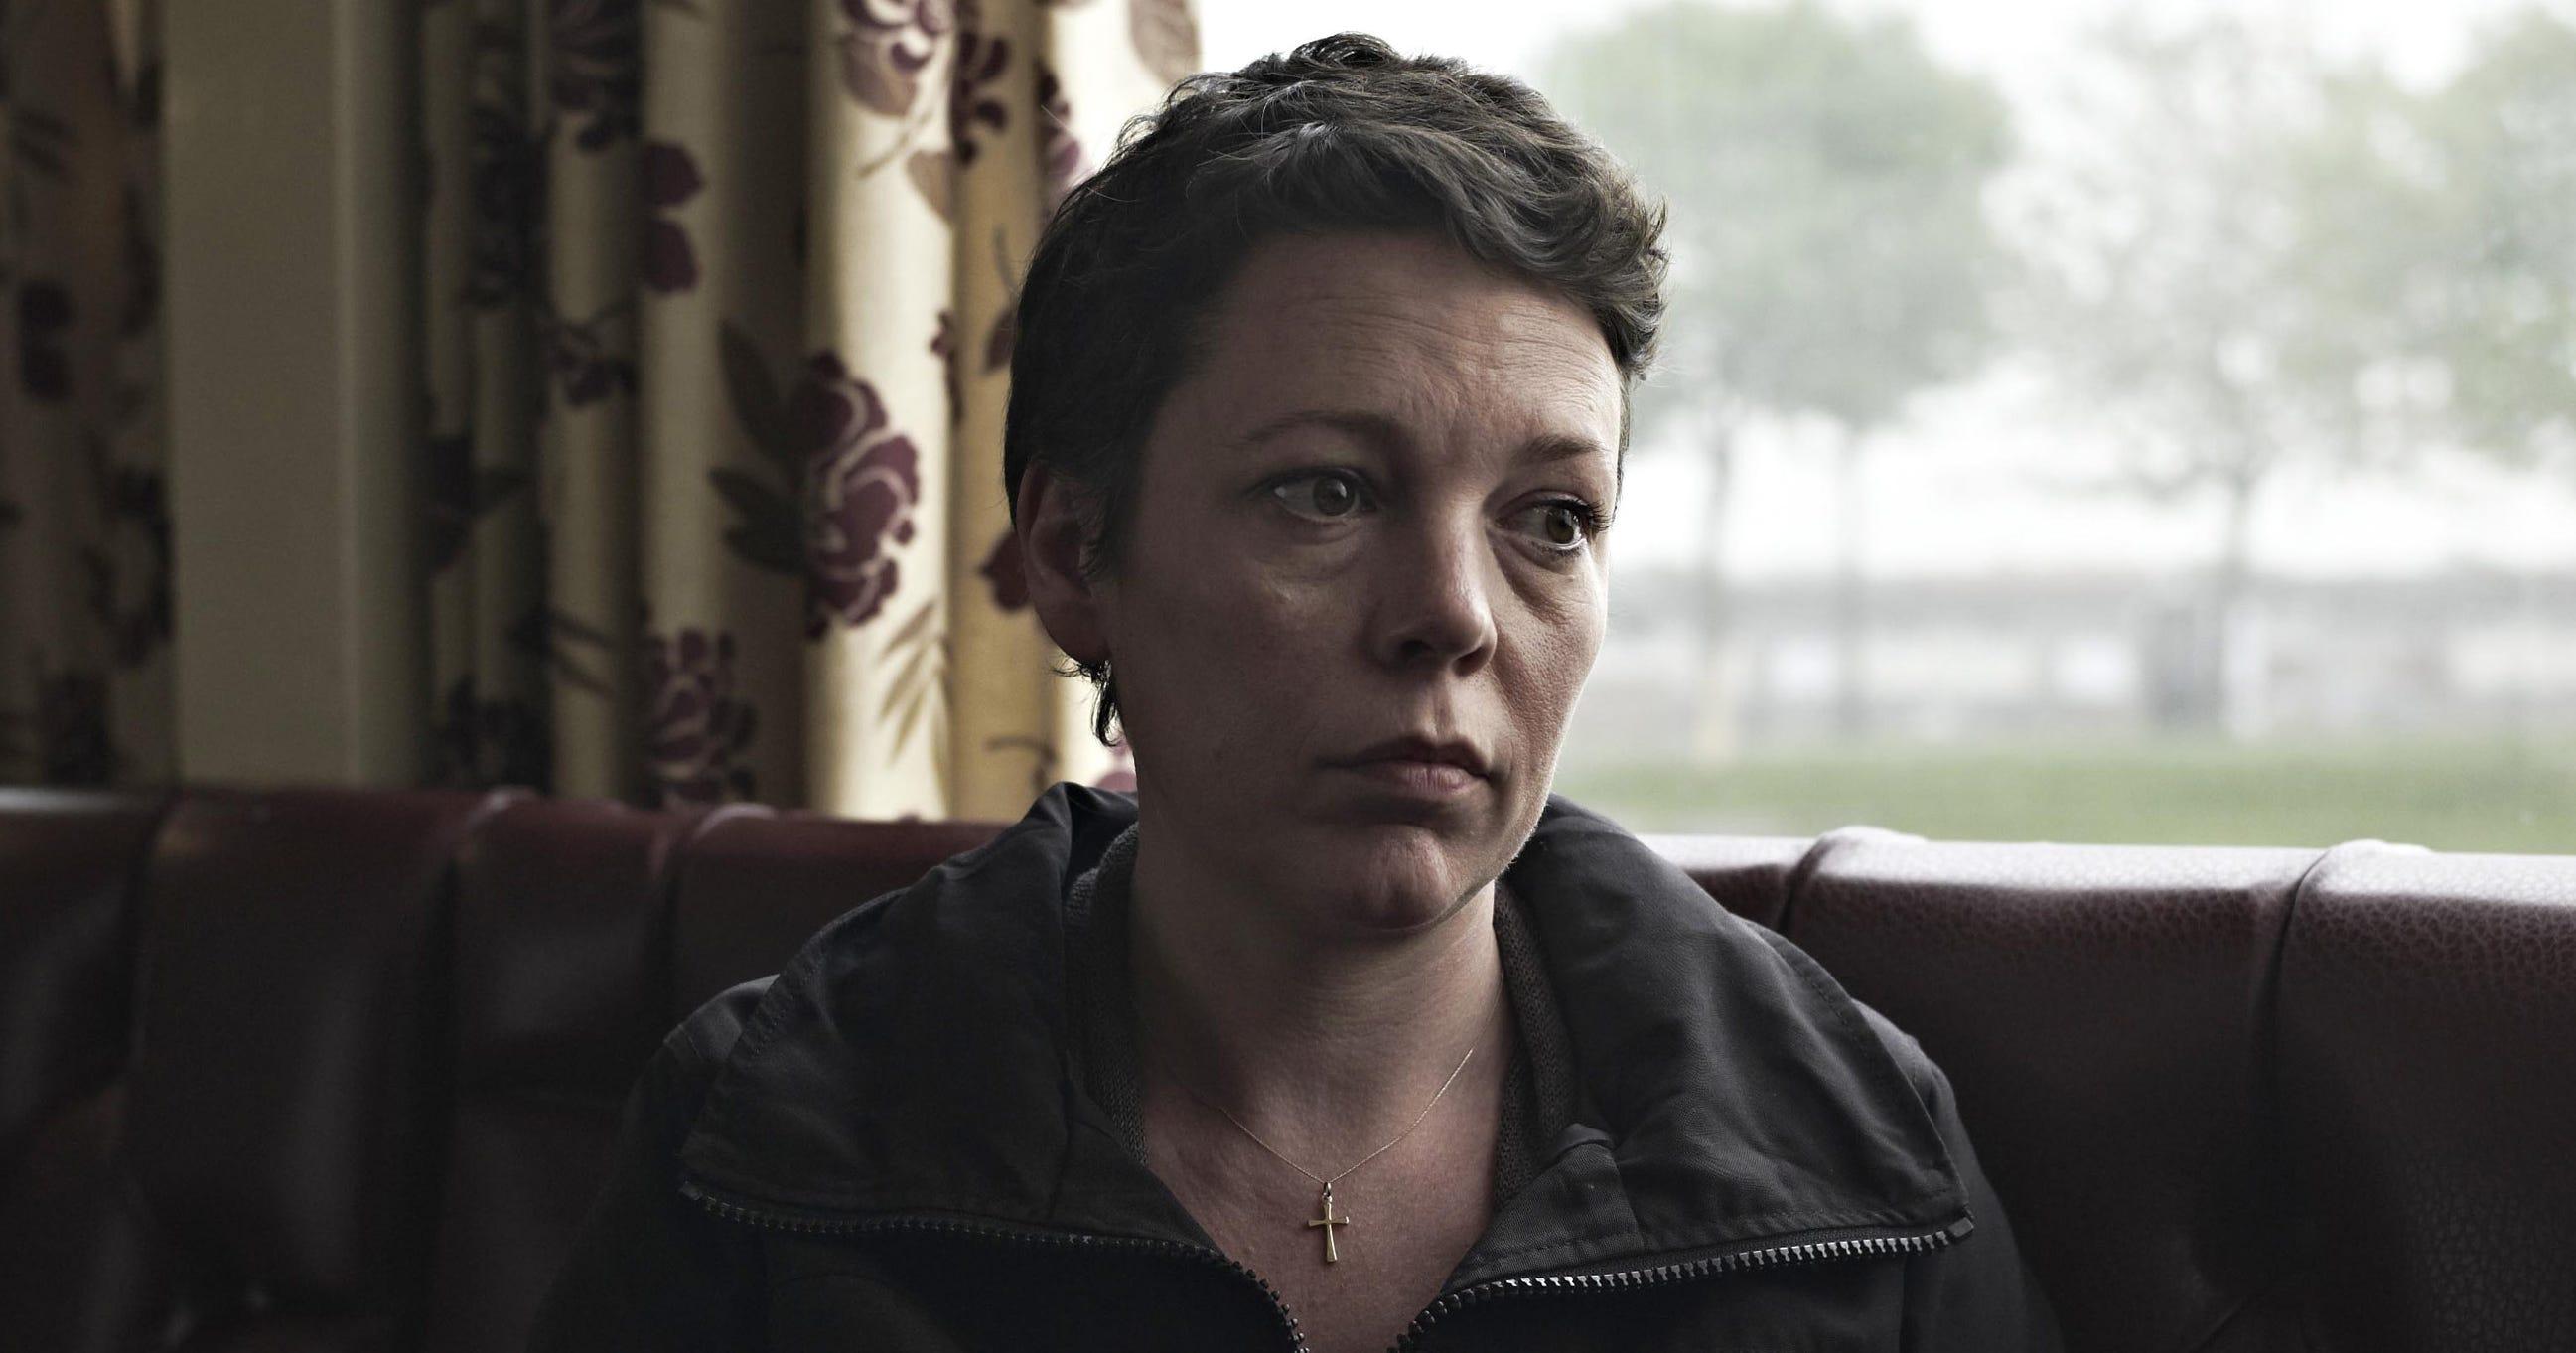 Olivia Colman Filme & Fernsehsendungen